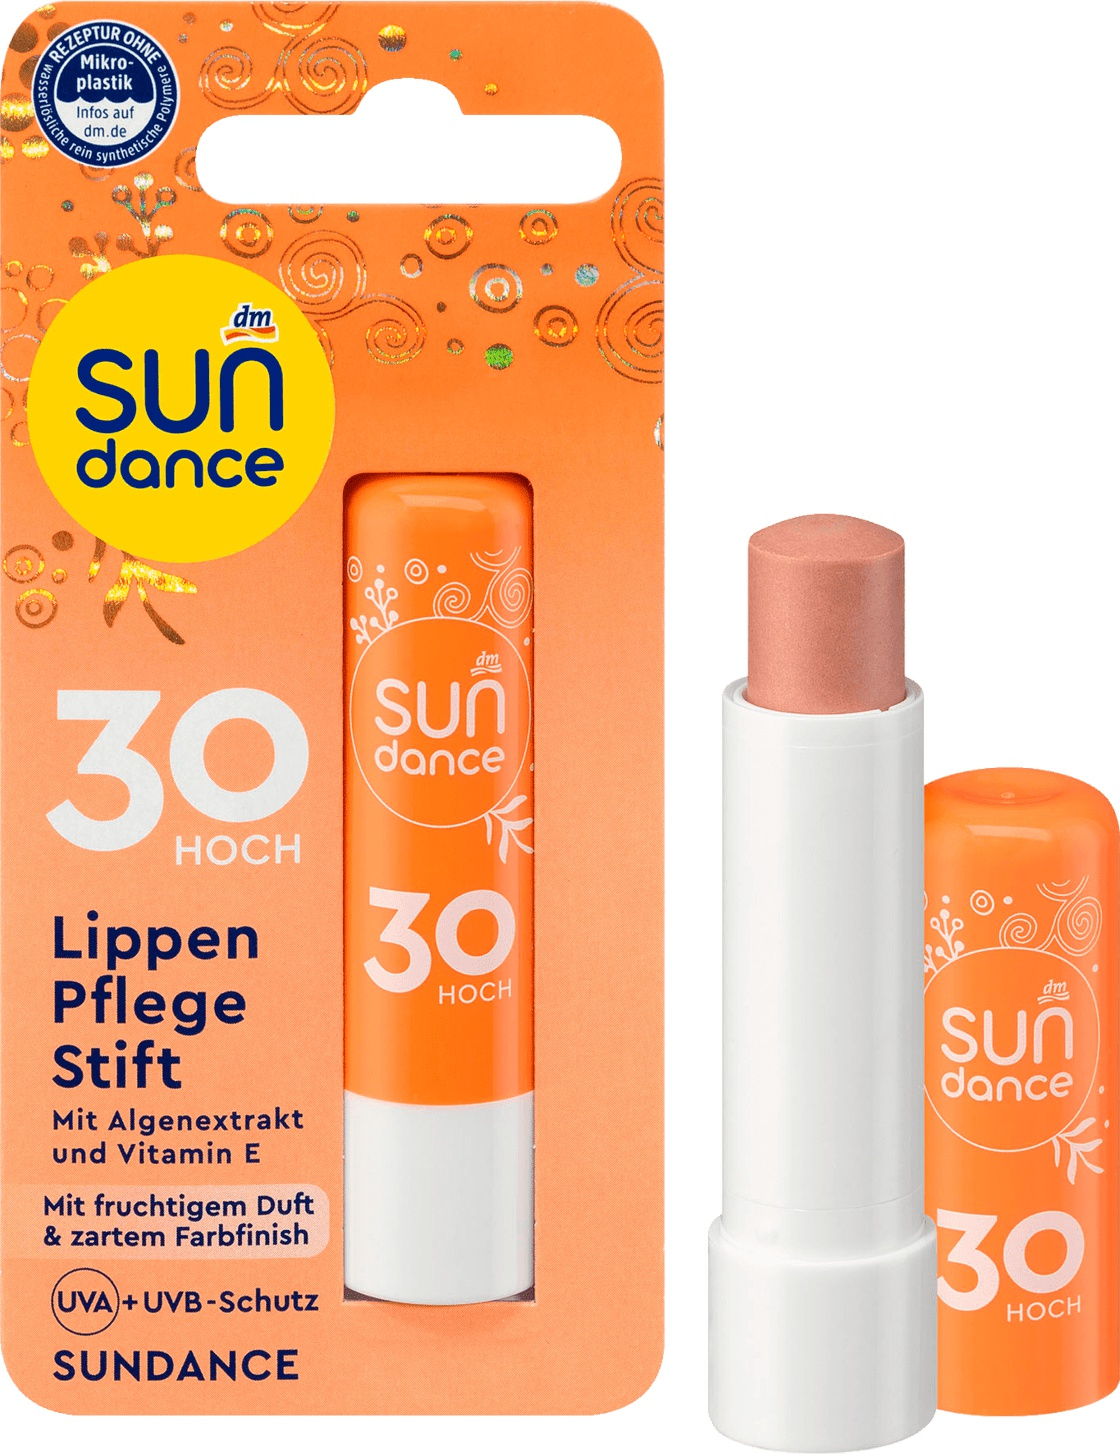 SUNdance Lippenpflege